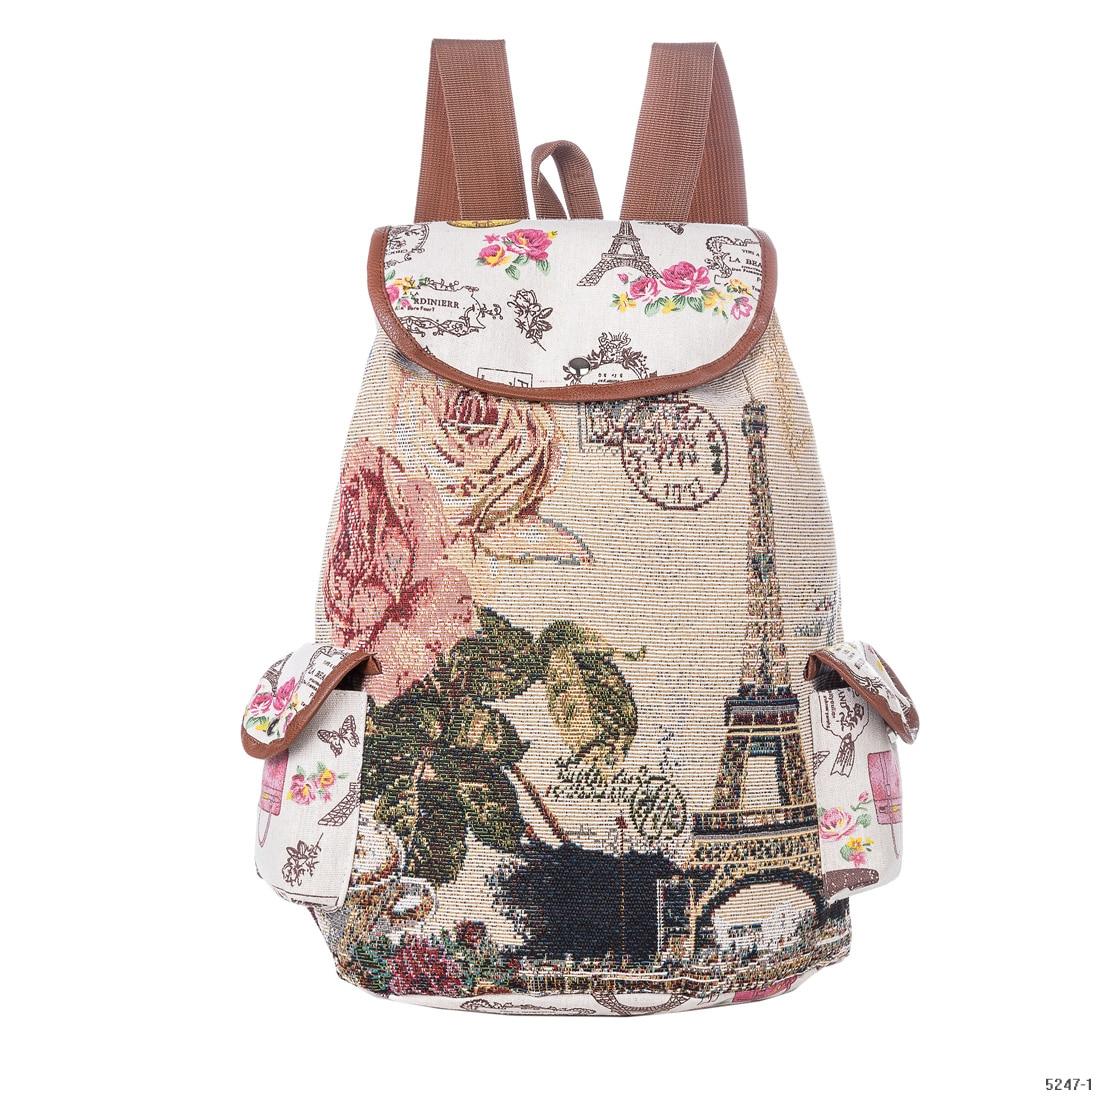 School Bag For Teenager Girl Travel Mochila Cute Brids Pinted Backpacks Drawstring Backpacks Girls School Bags Eiffel Tower